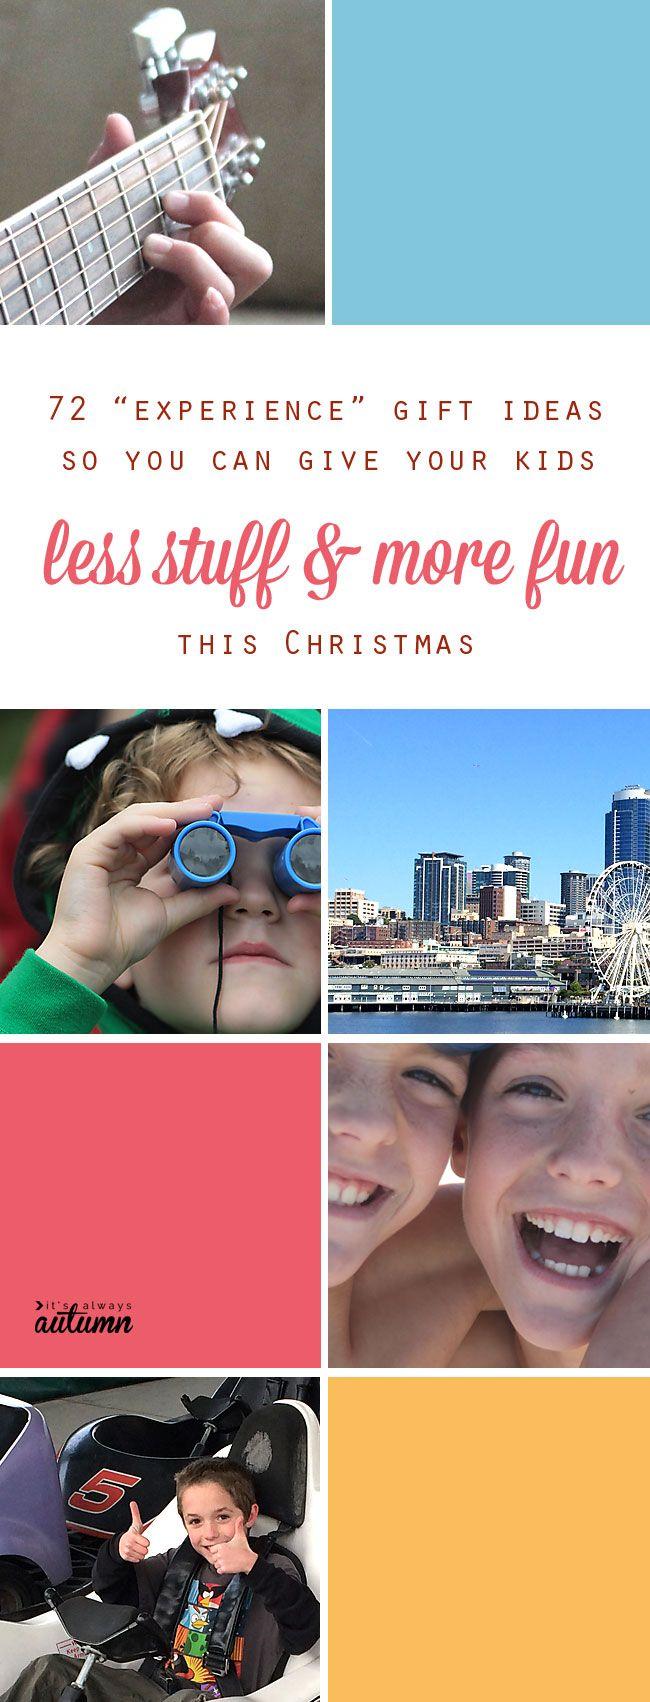 christmas gift ideas experiences